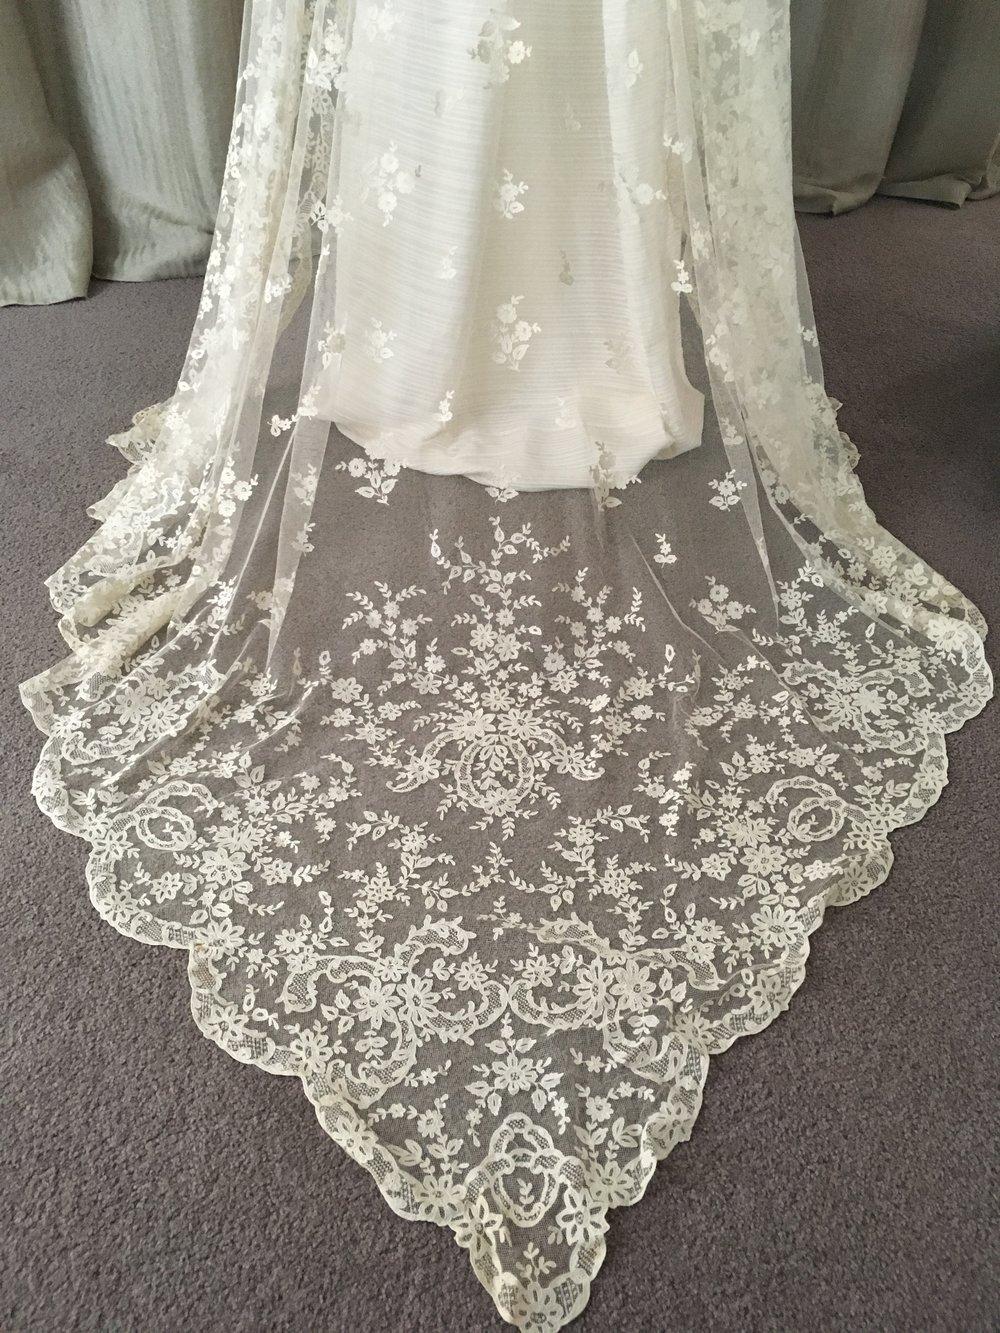 Elisabeth's veil